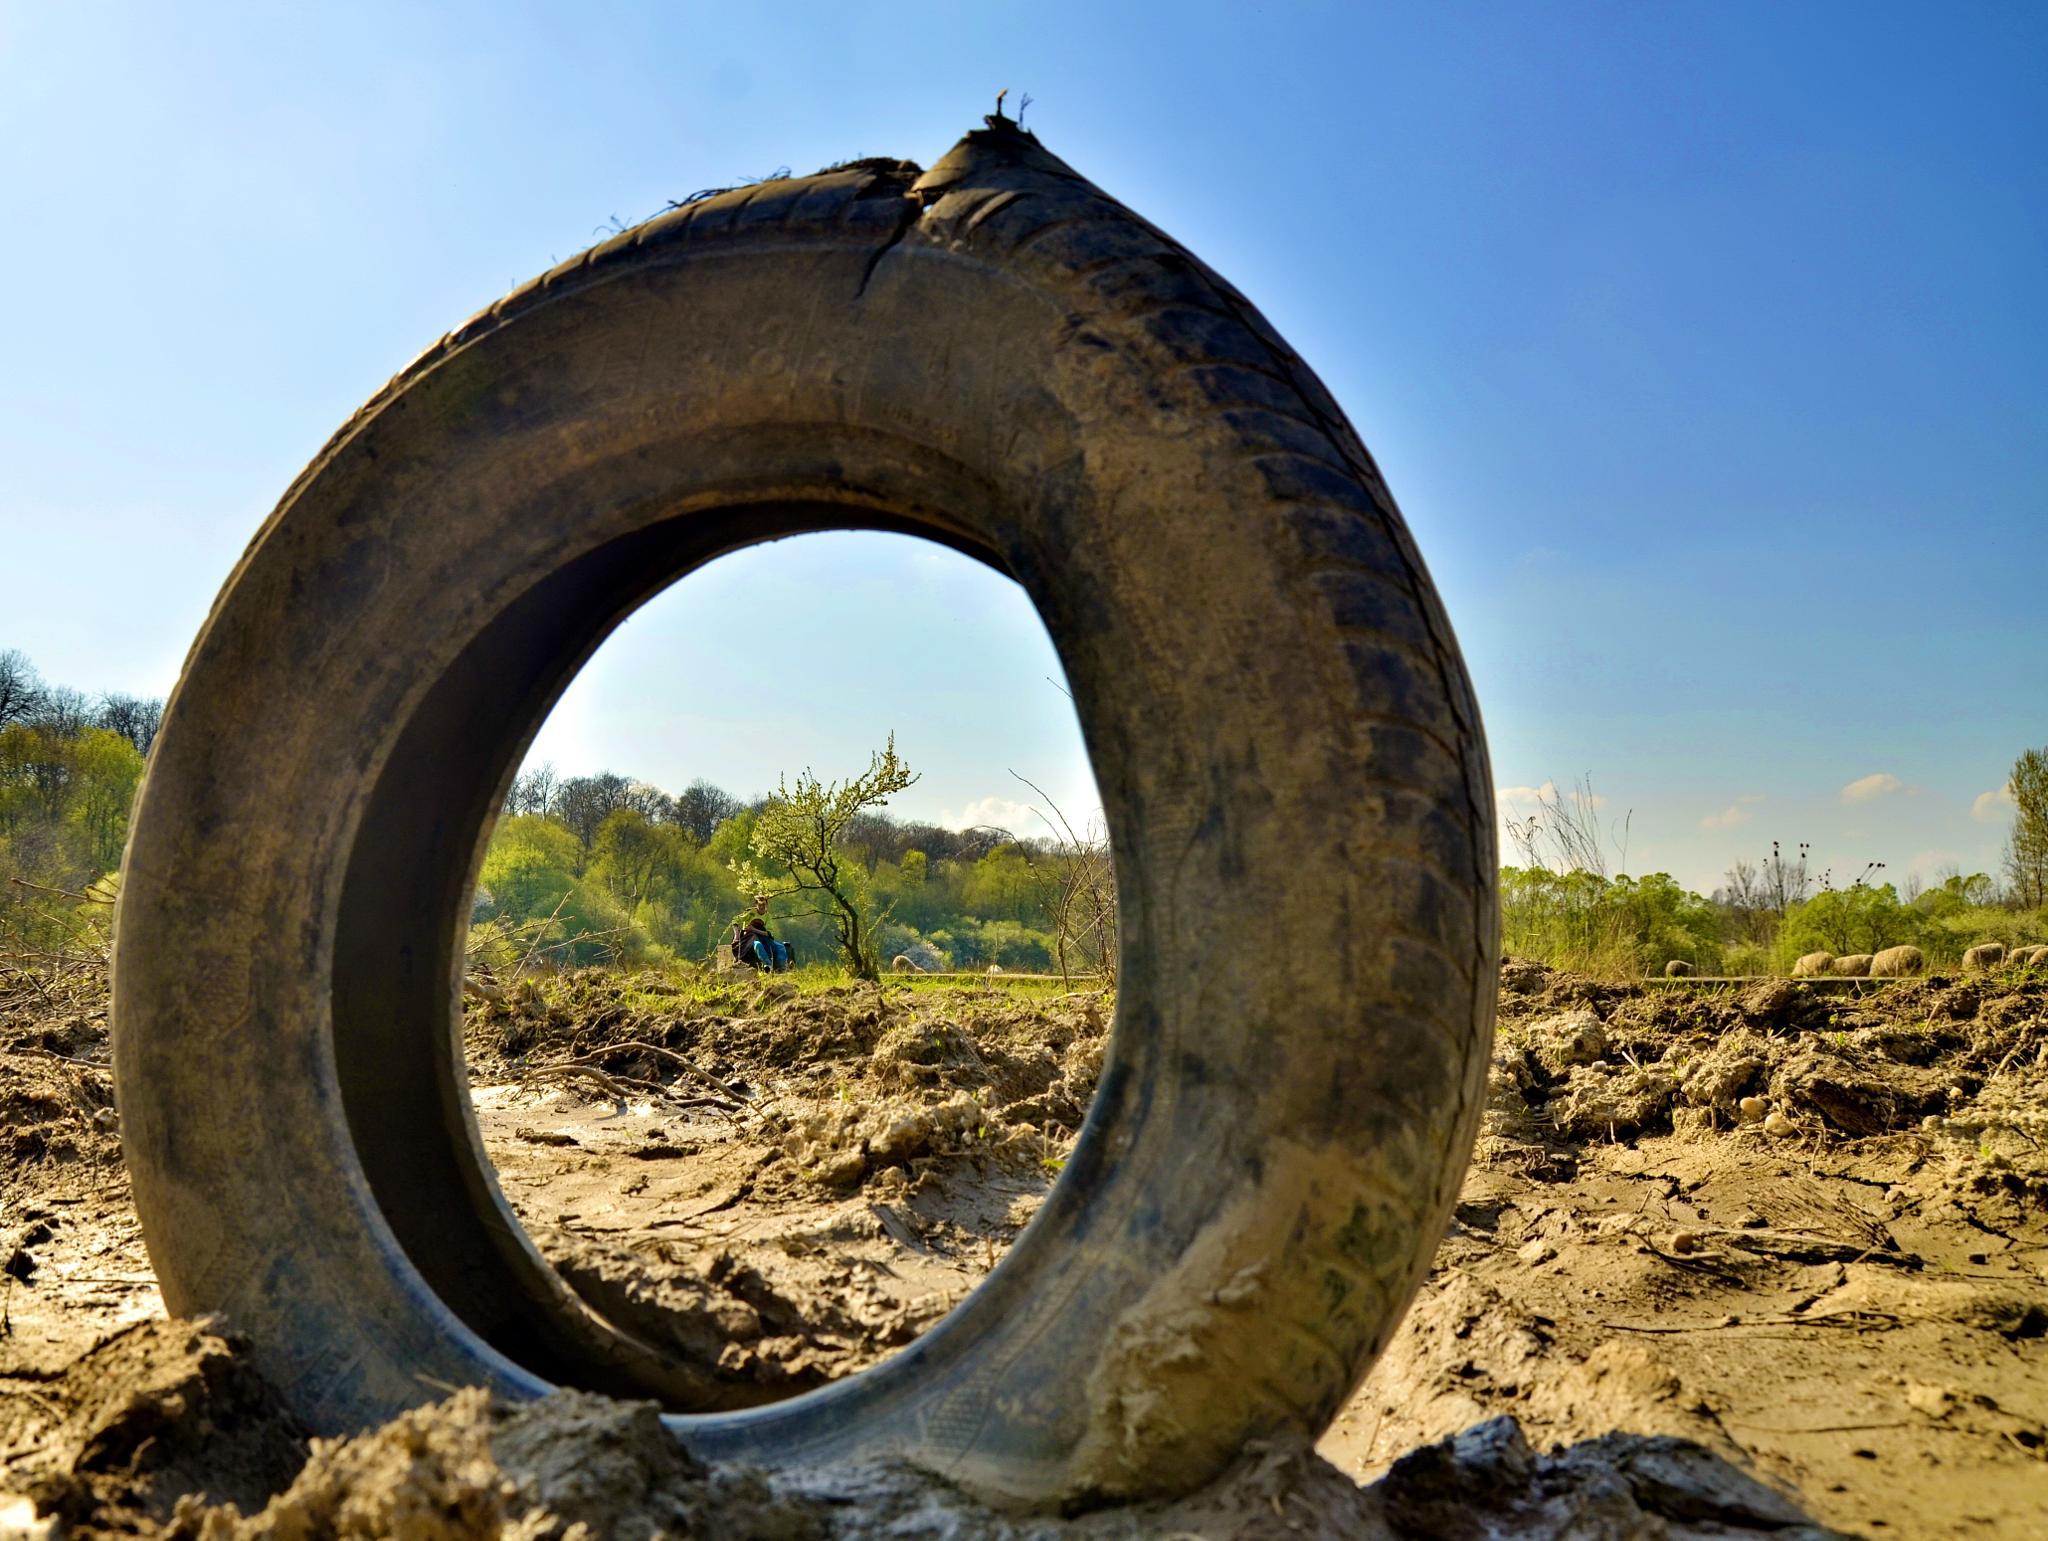 tire view by edyctin